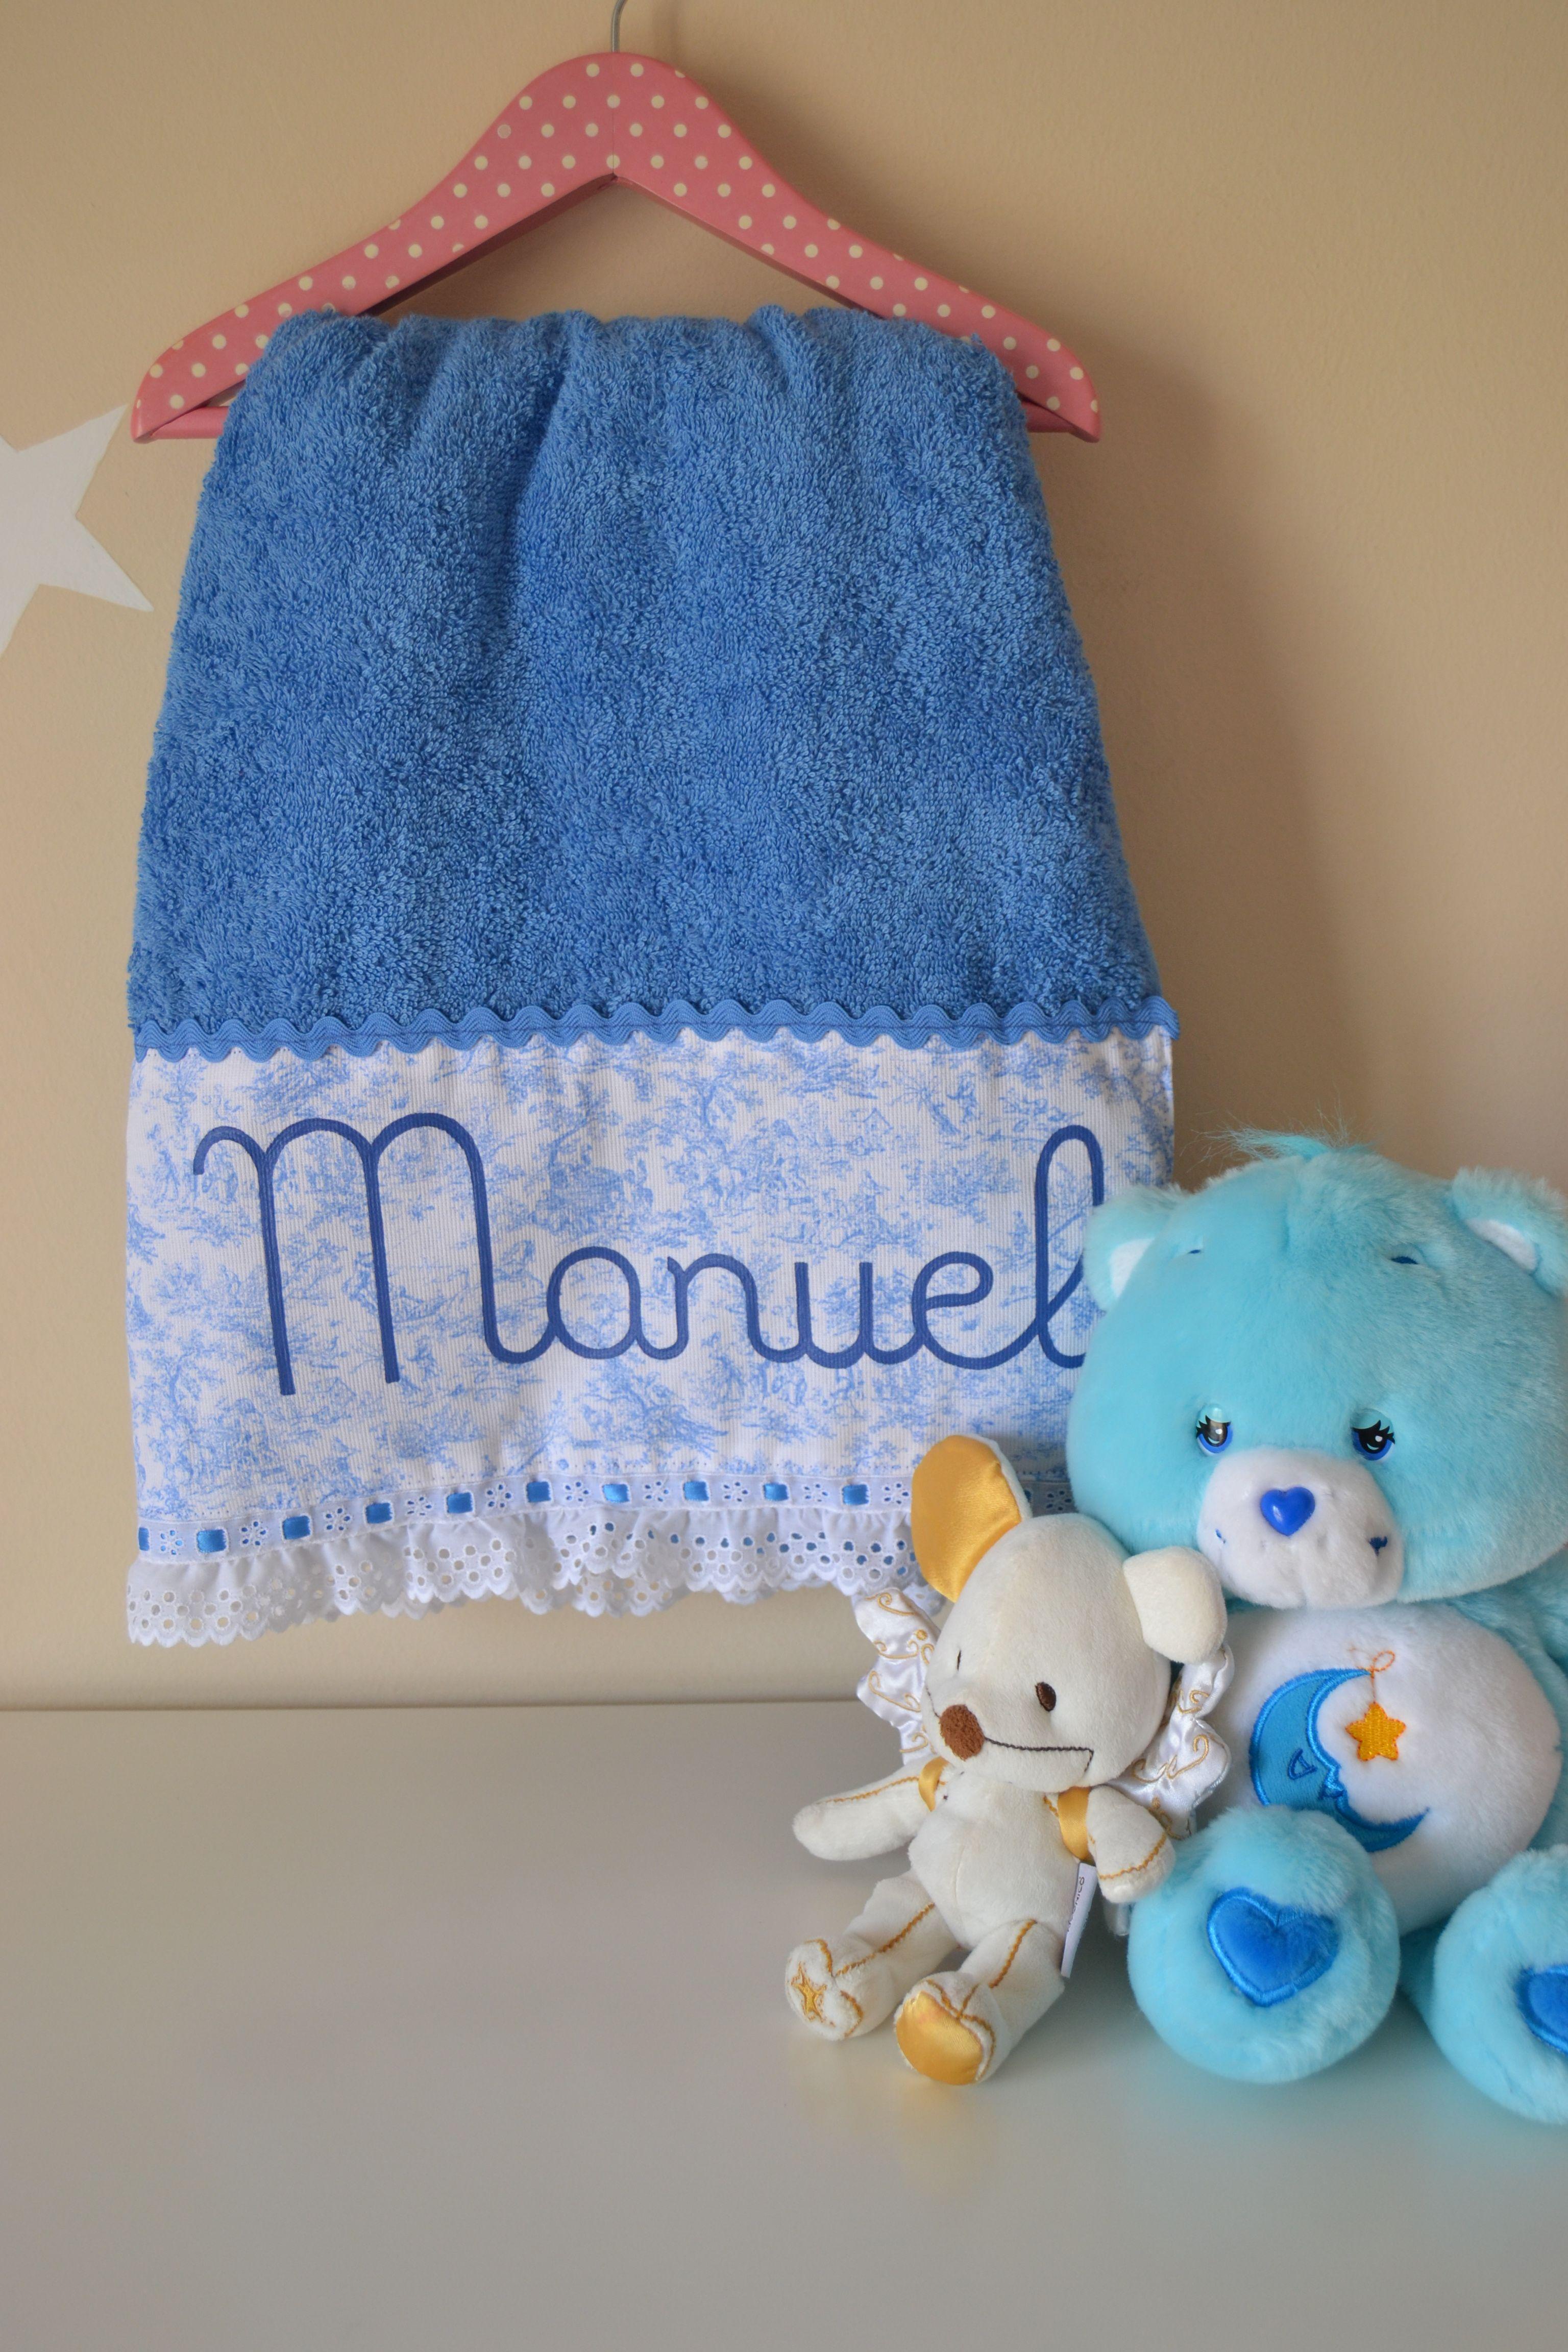 Toalla Personalizada Para Bebe Toallas Toallas Personalizadas Toallas Bordadas